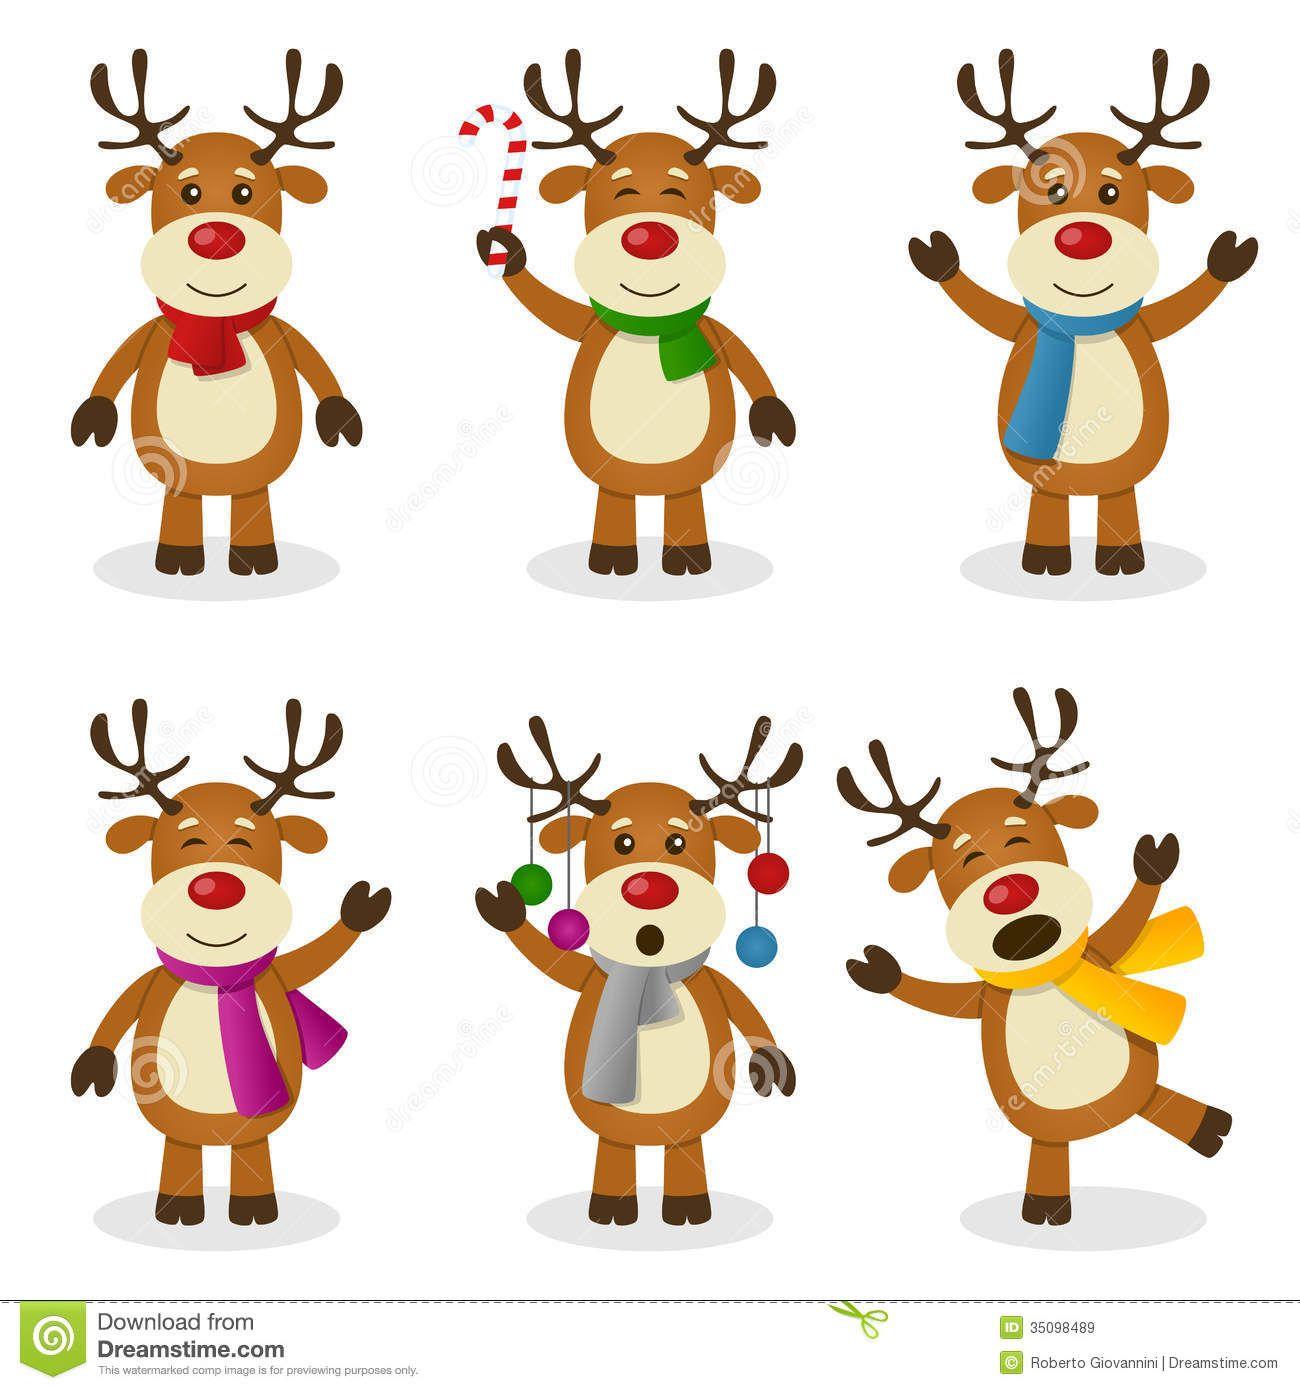 Reindeer Border Clipart.